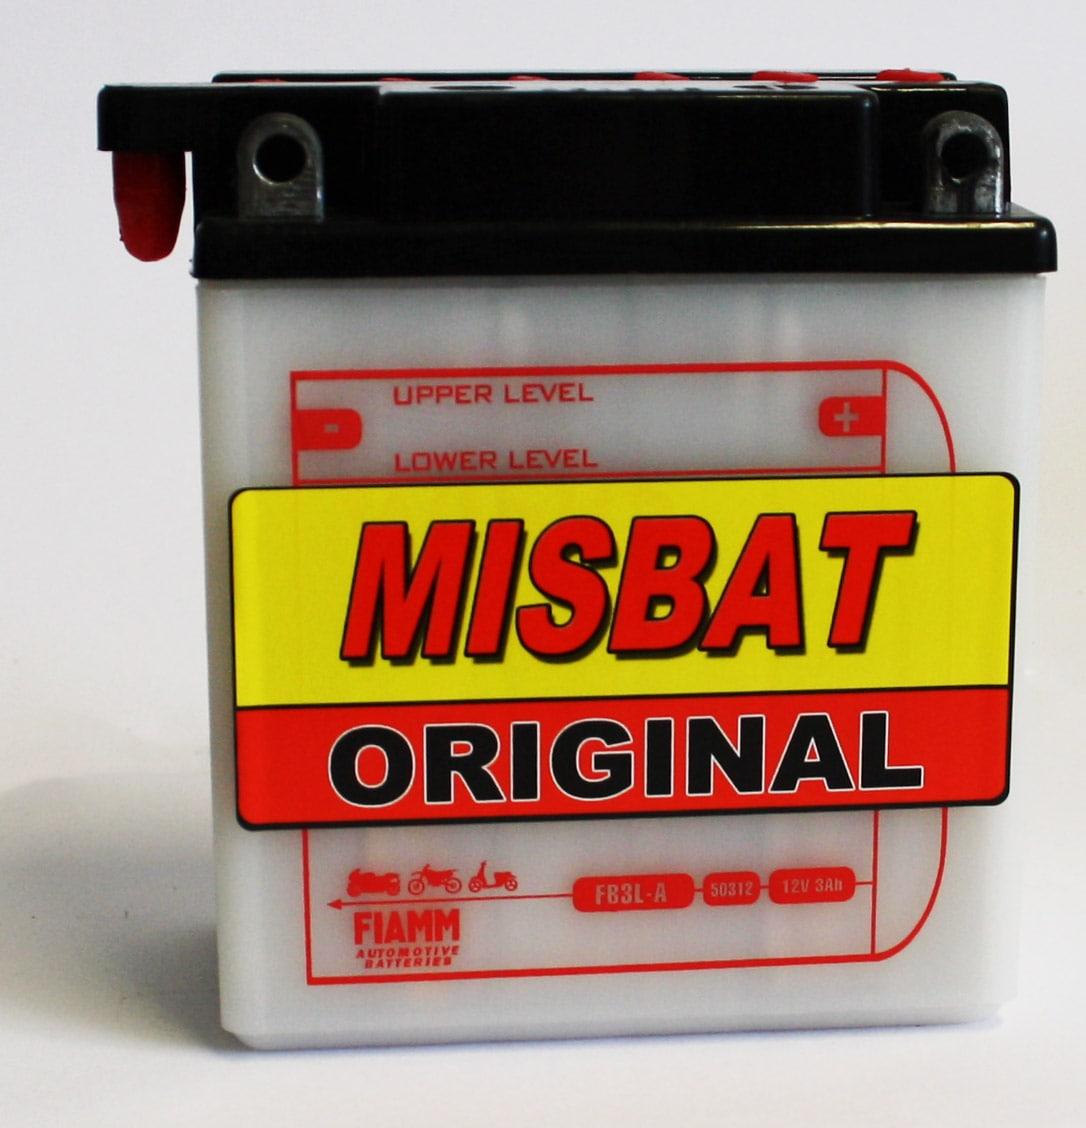 MISBAT MC 3 AH